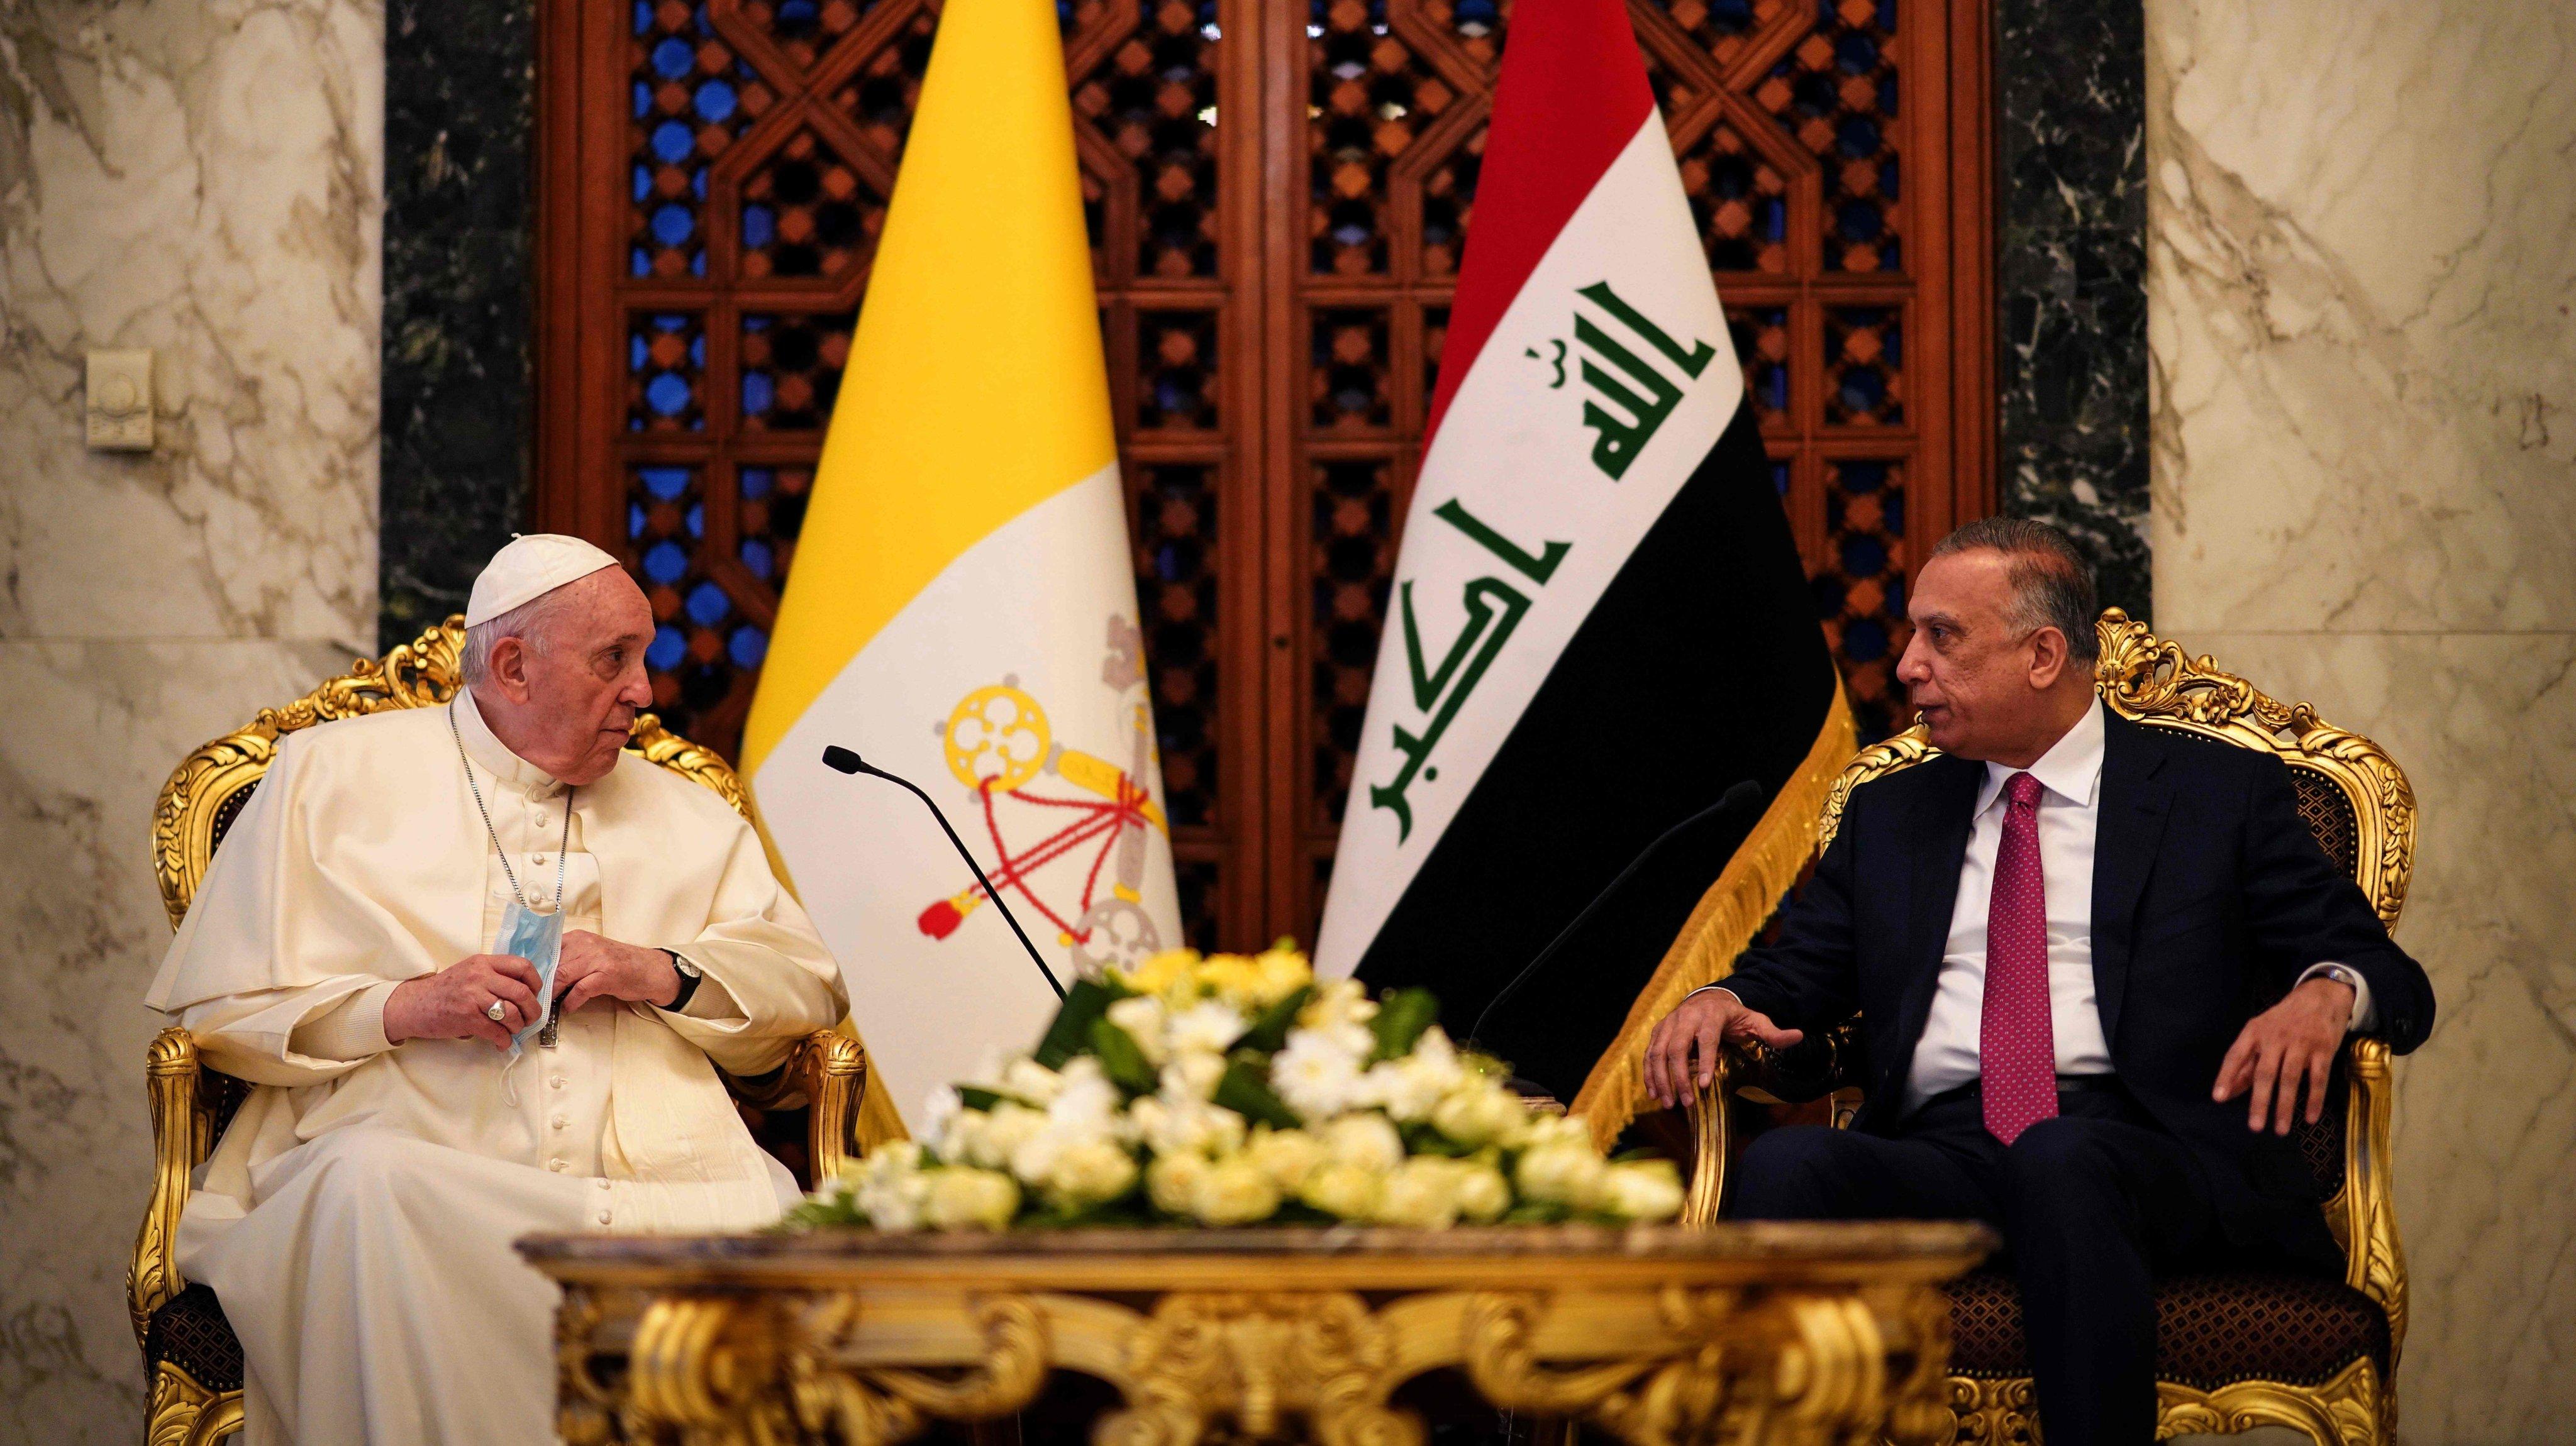 IRAQ-VATICAN-POPE